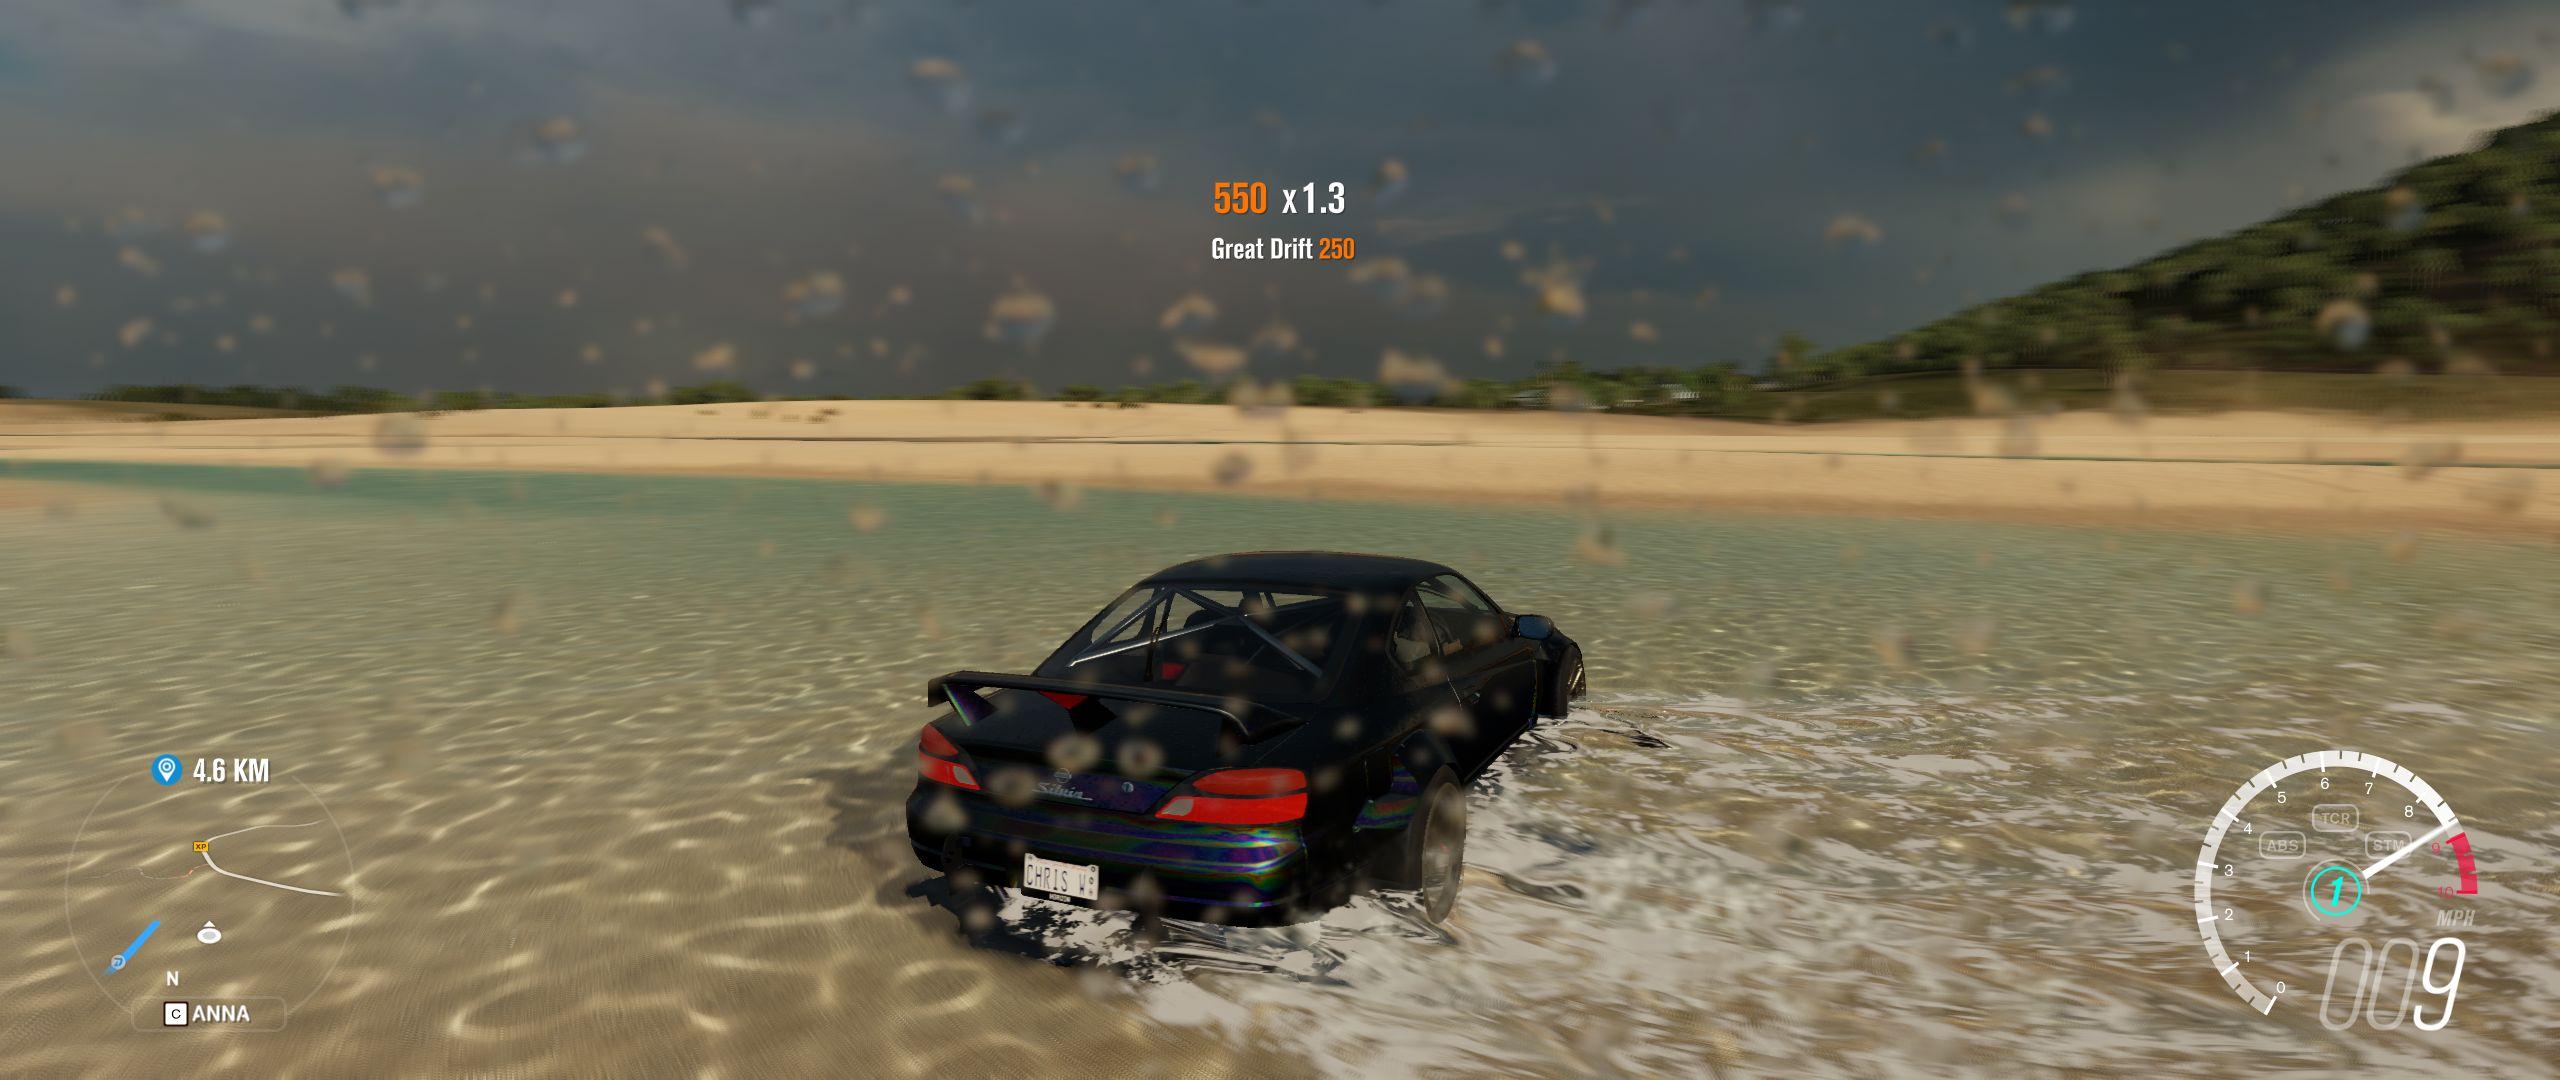 Forza Horizon 3 Review Welcome To Australia Cobber